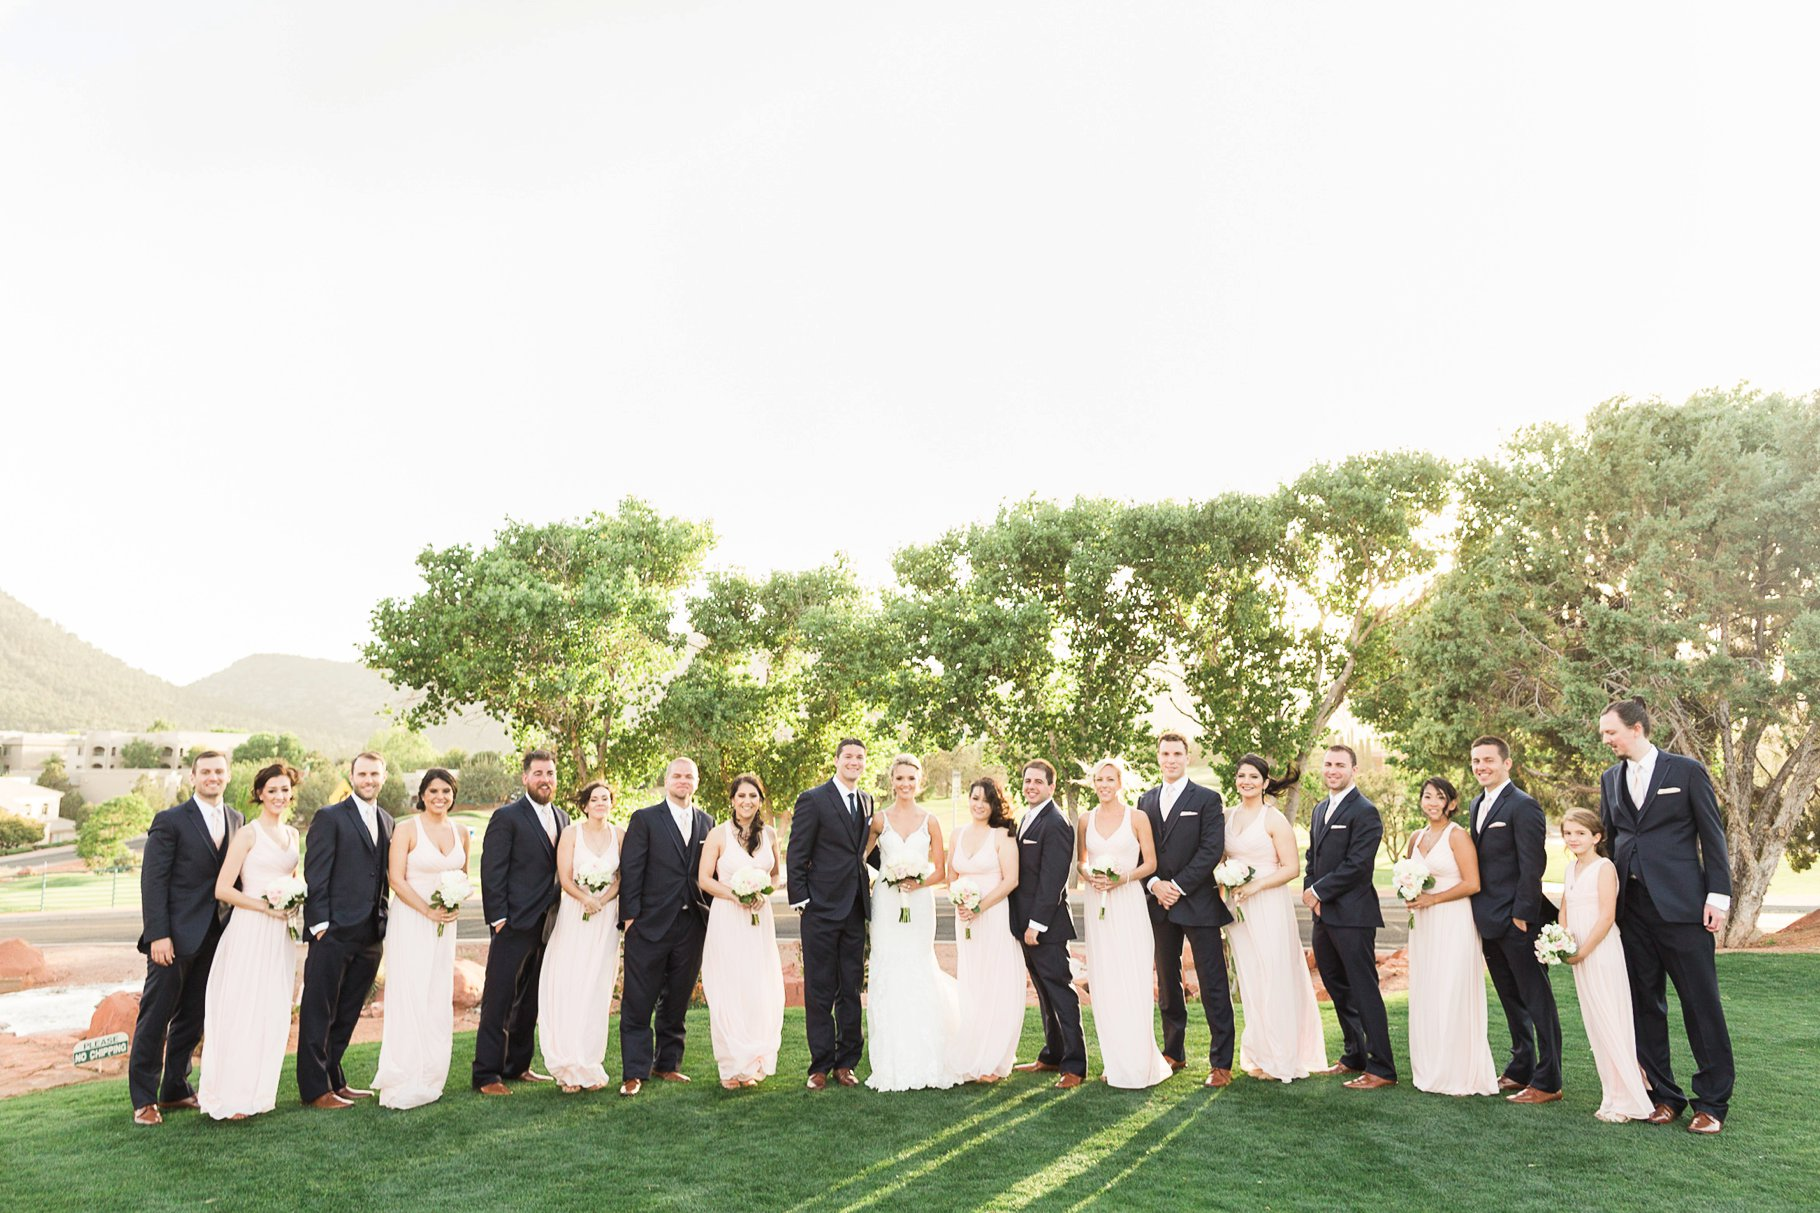 sedona wedding-98_GRETCHEN WAKEMAN PHOTOGRAPHY.jpg